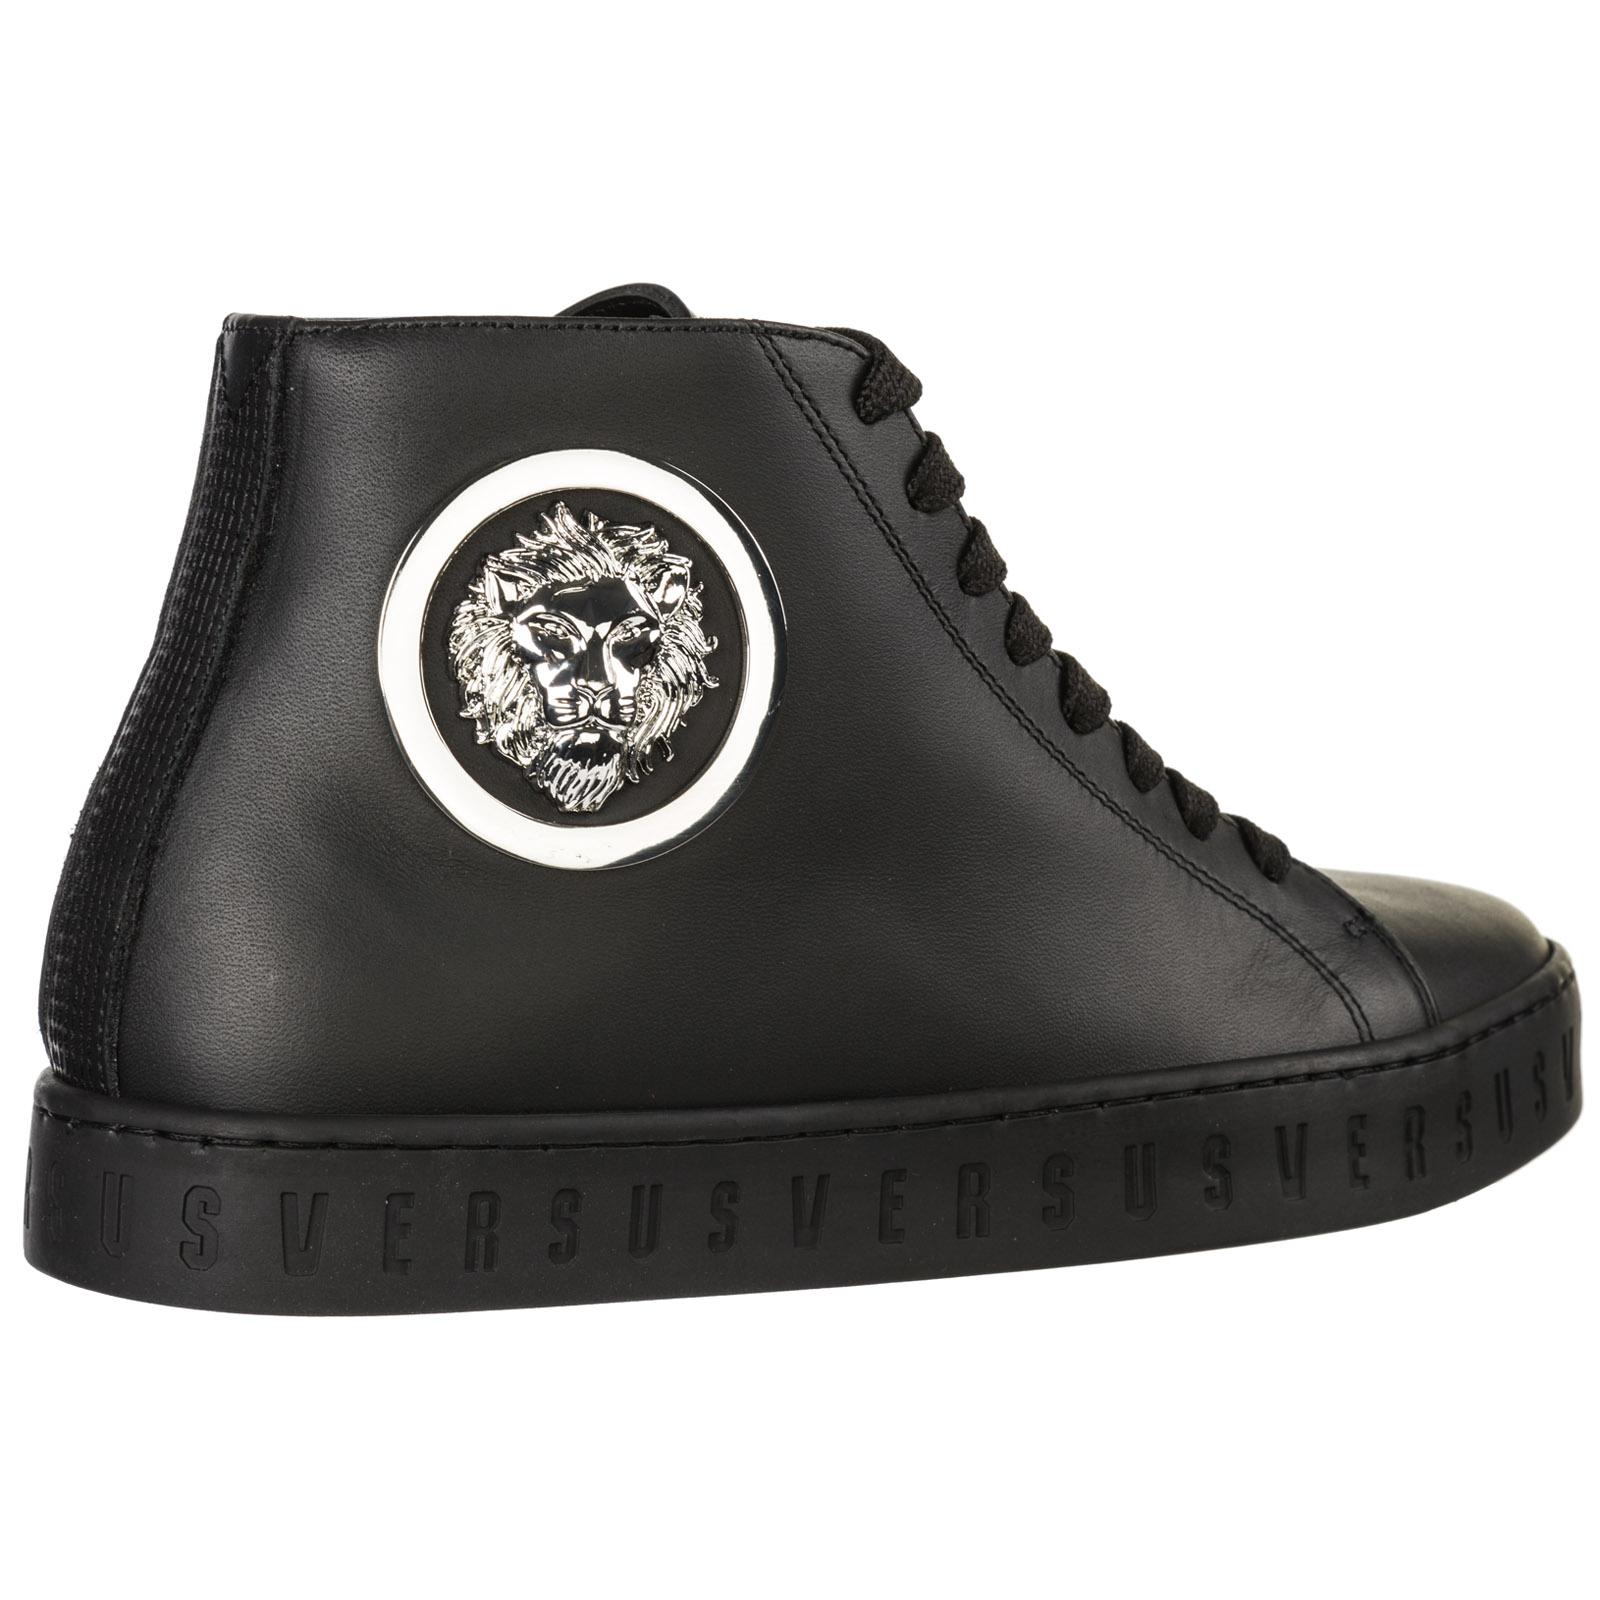 huge selection of e9062 49c22 Scarpe sneakers alte donna in pelle lion head